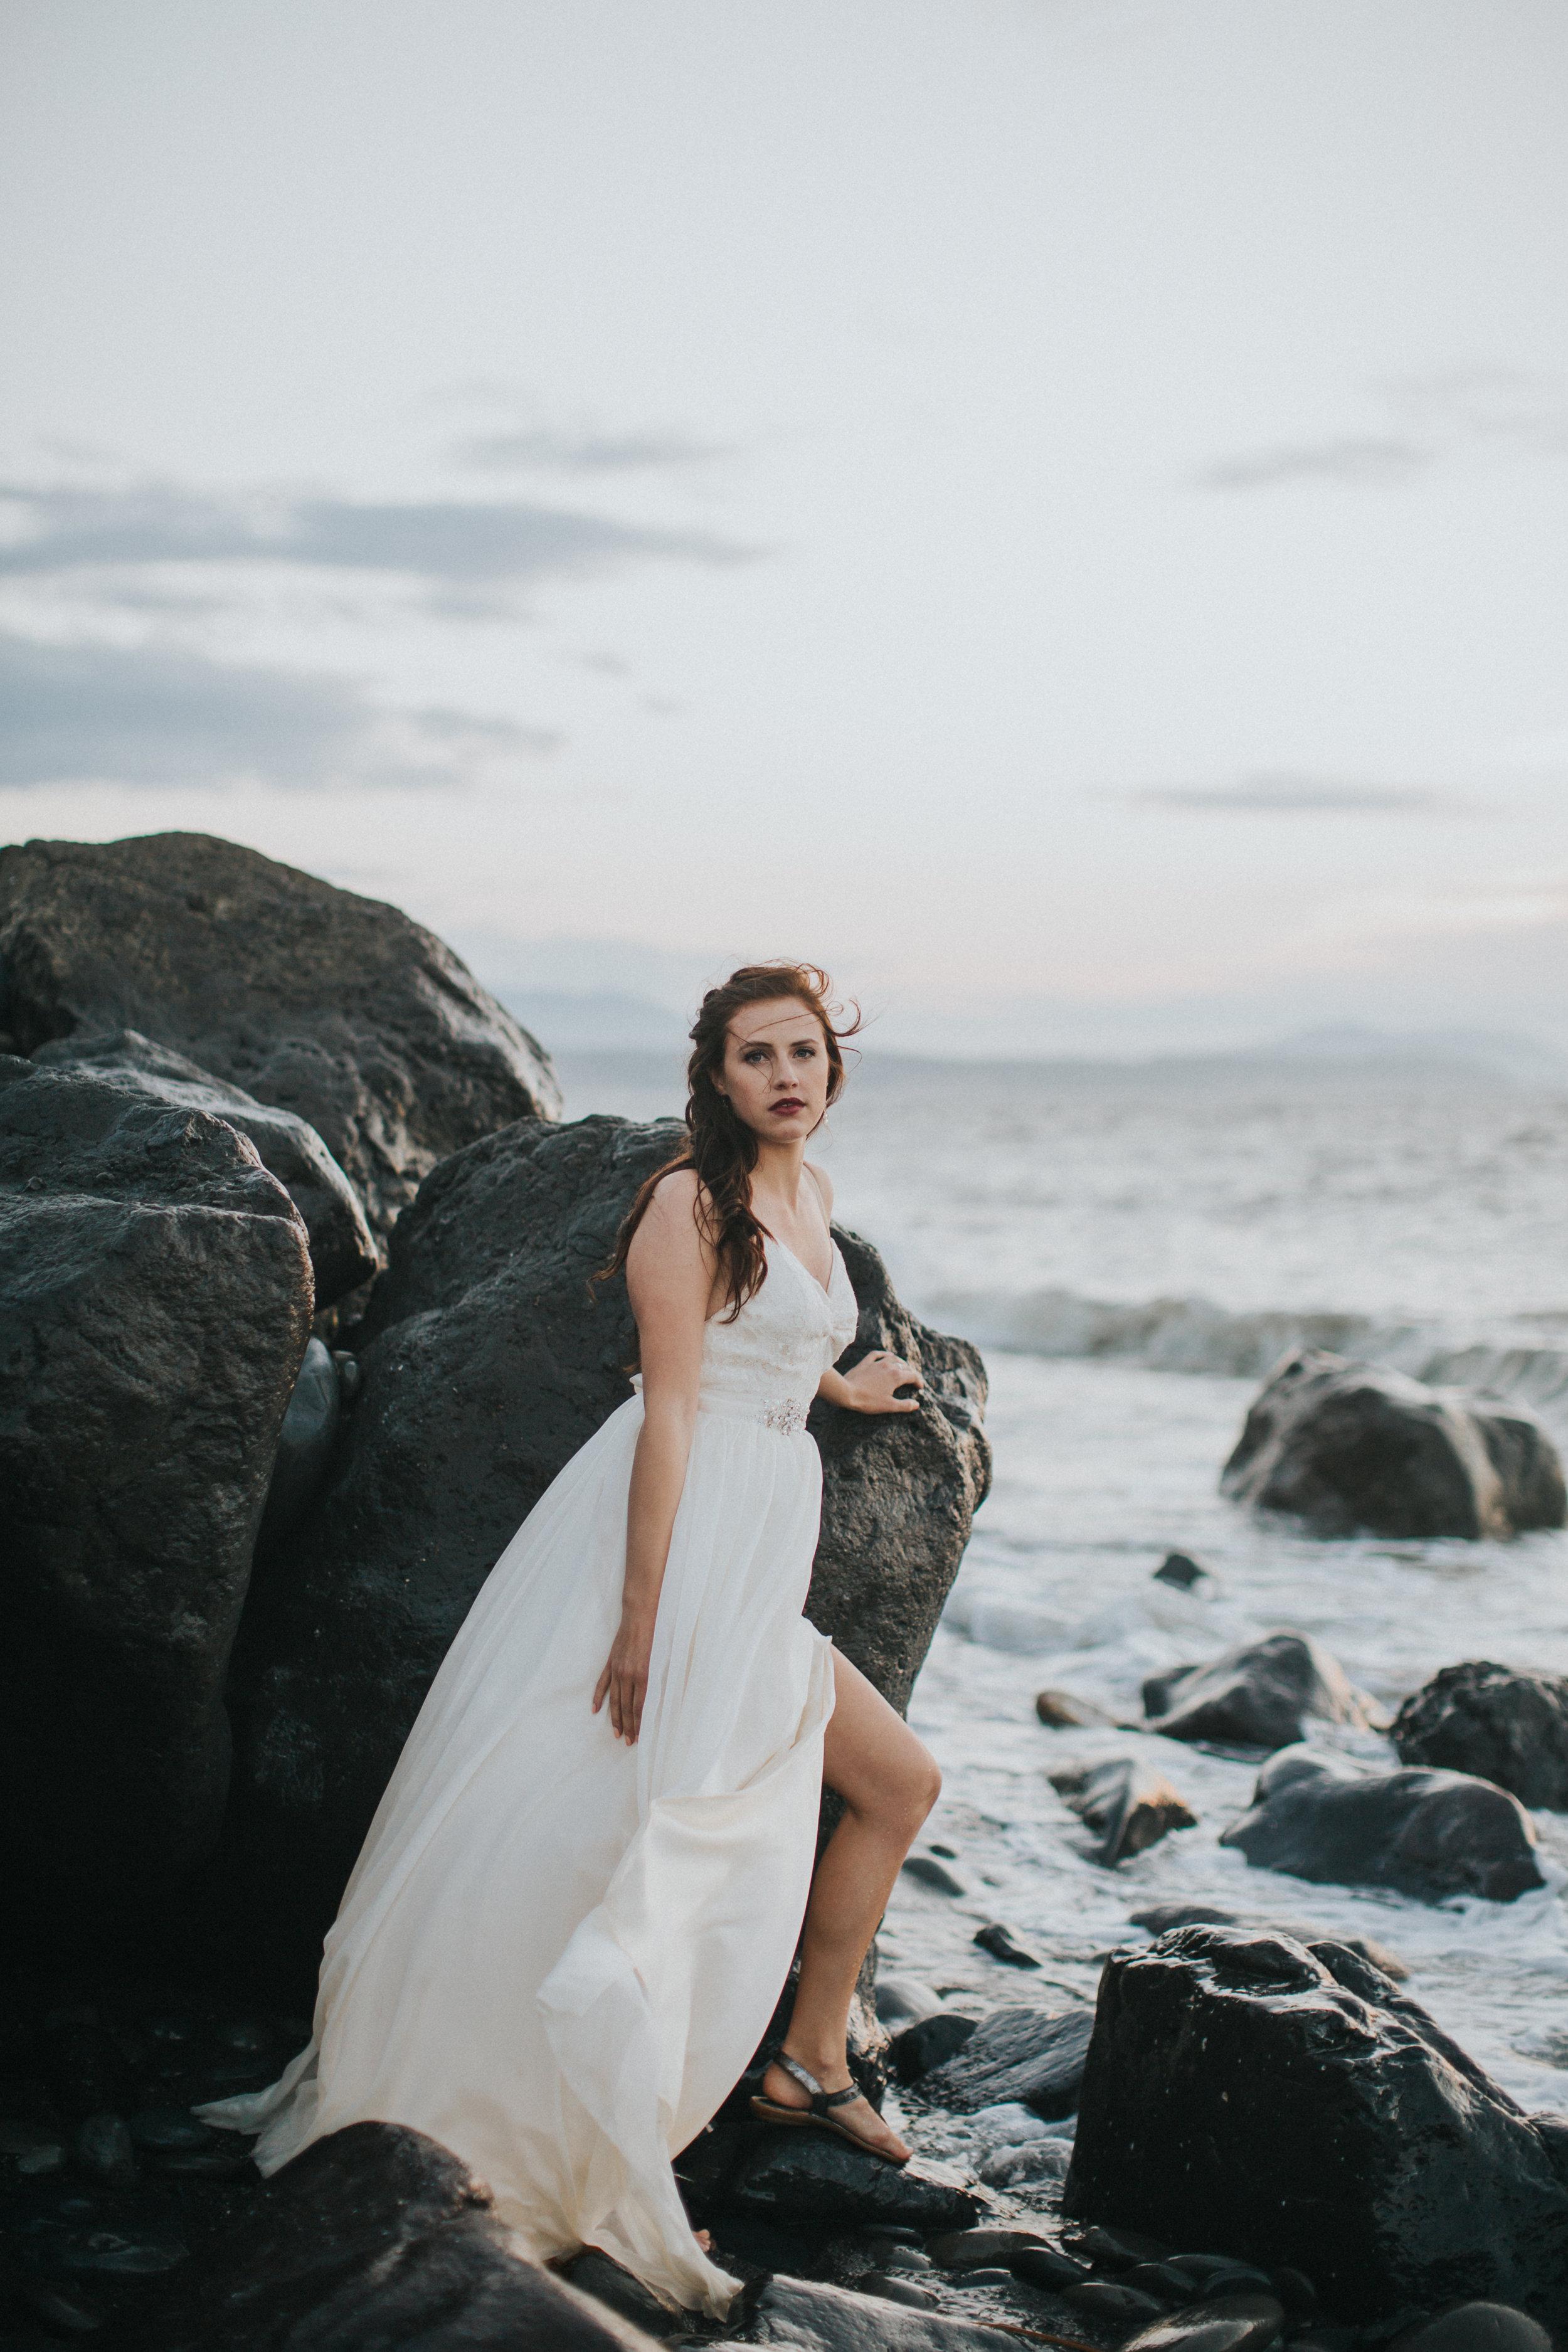 Port-Angeles-Photographer-Olympic-Peninsula-Wedding-Ediz-Hook-bride-dress-Kayla-Dawn-Photography-Olympic-Peninsula-PNW-Photographer-Portrait-Portraiture-Natural-Golden-Hour-Beach (8).jpg